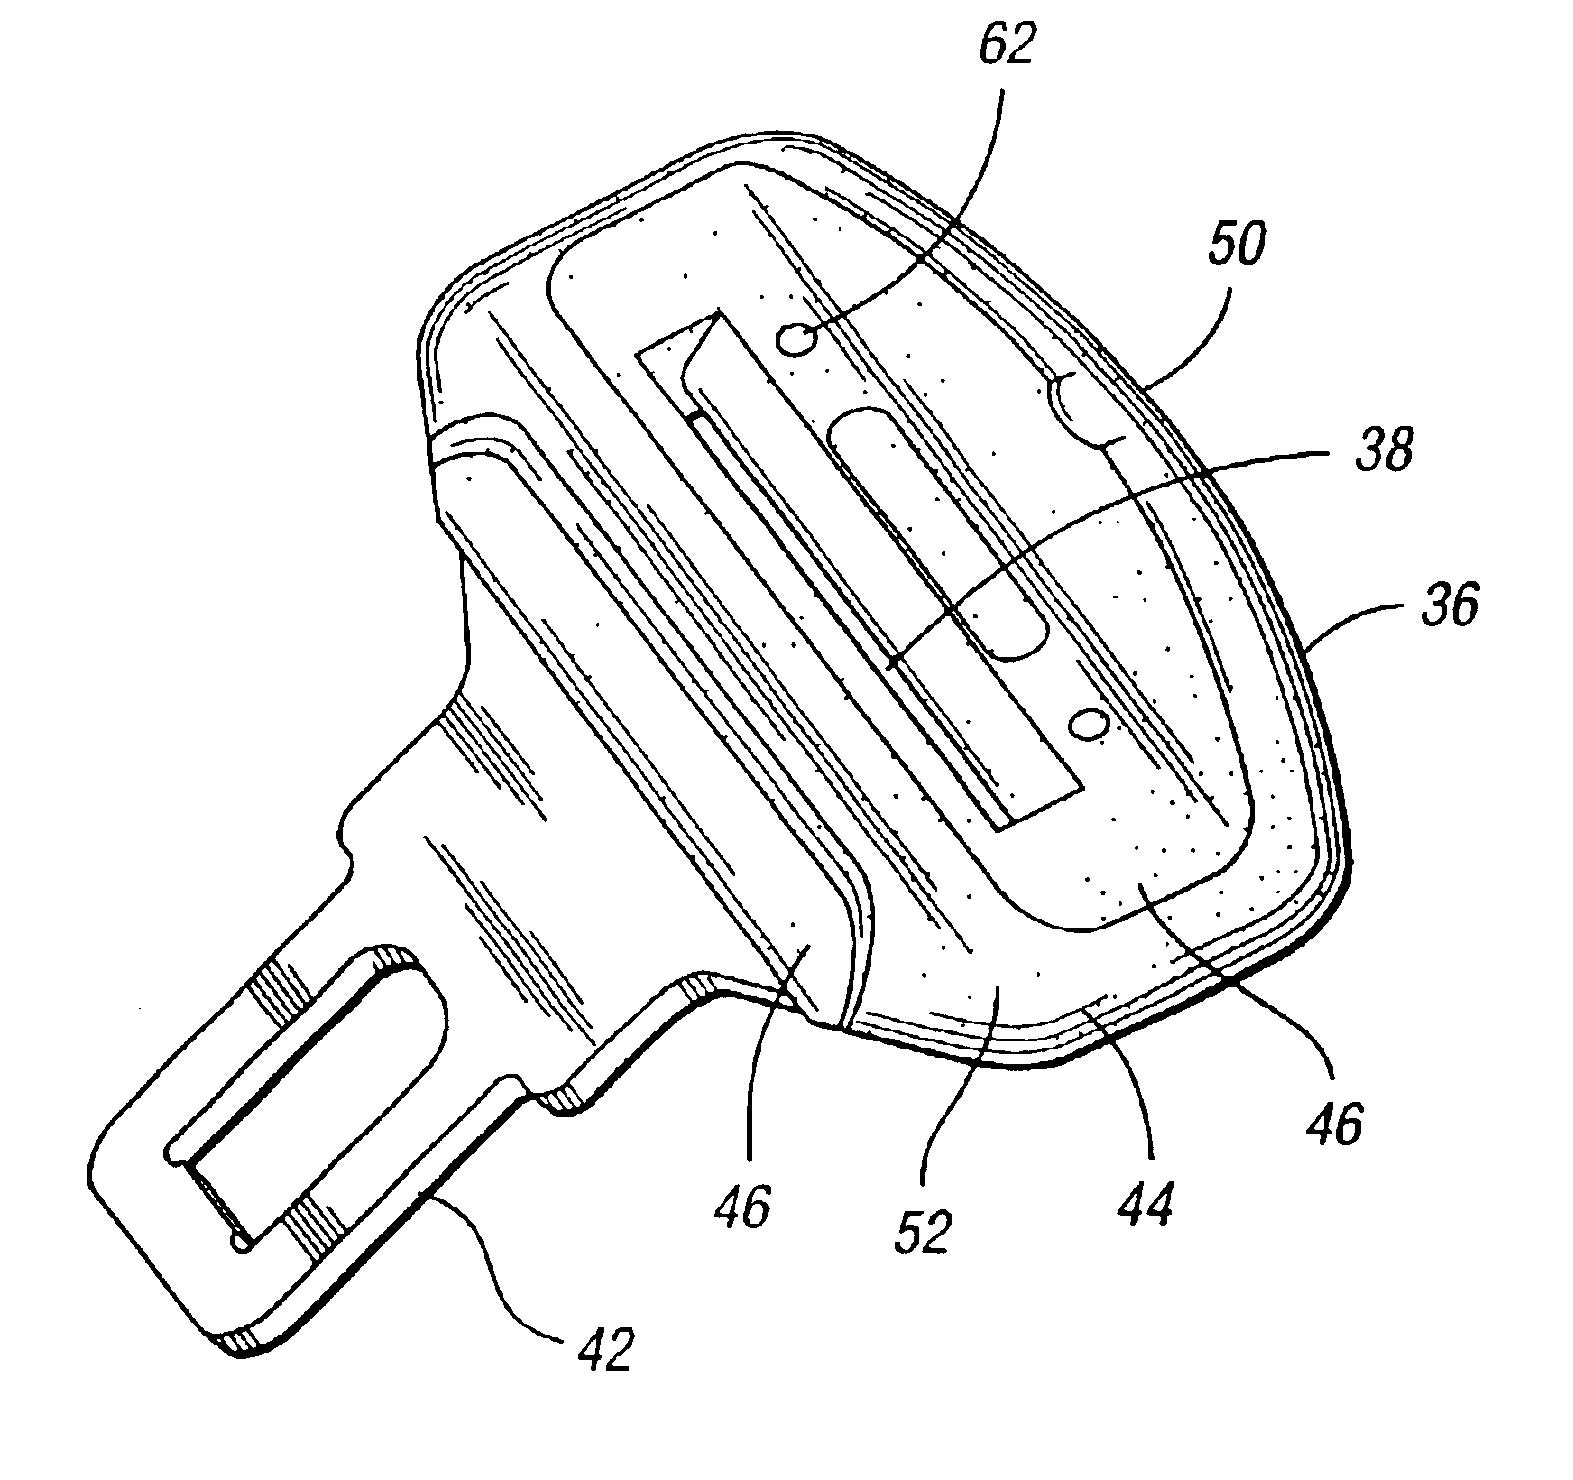 hight resolution of seat belt diagram google data diagram schematic seat belt diagram google